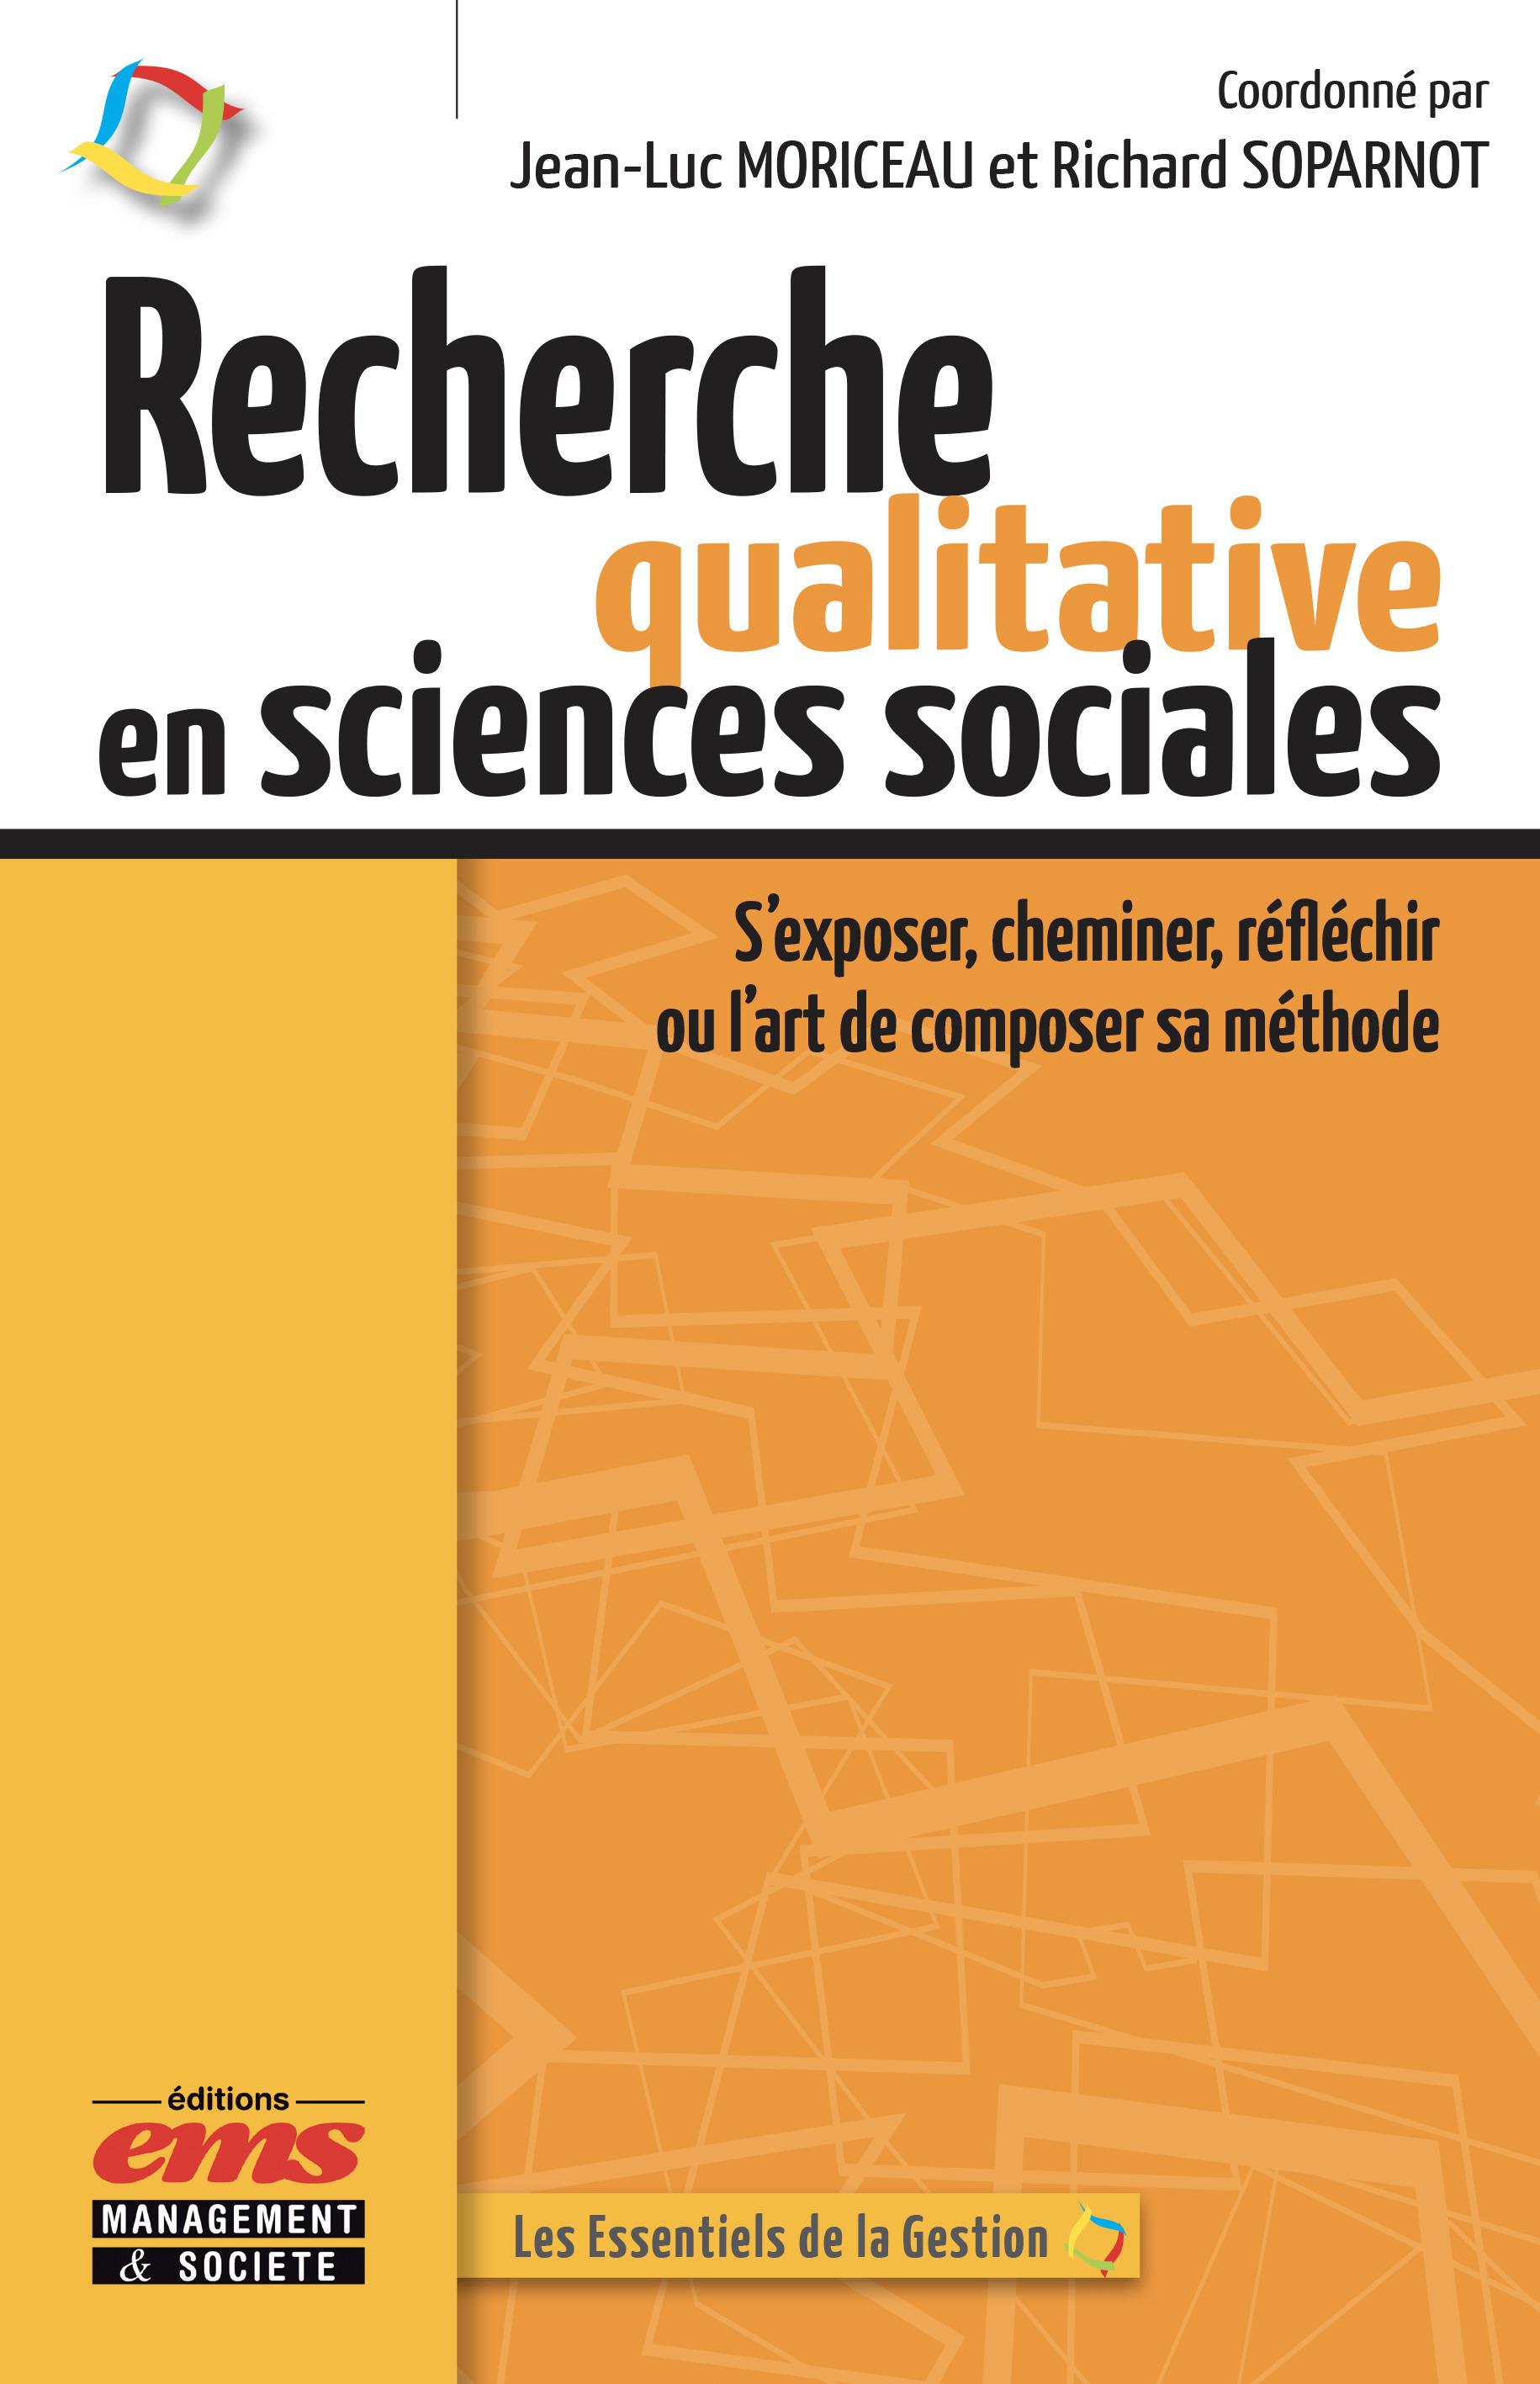 Recherche qualitative en sciences sociales